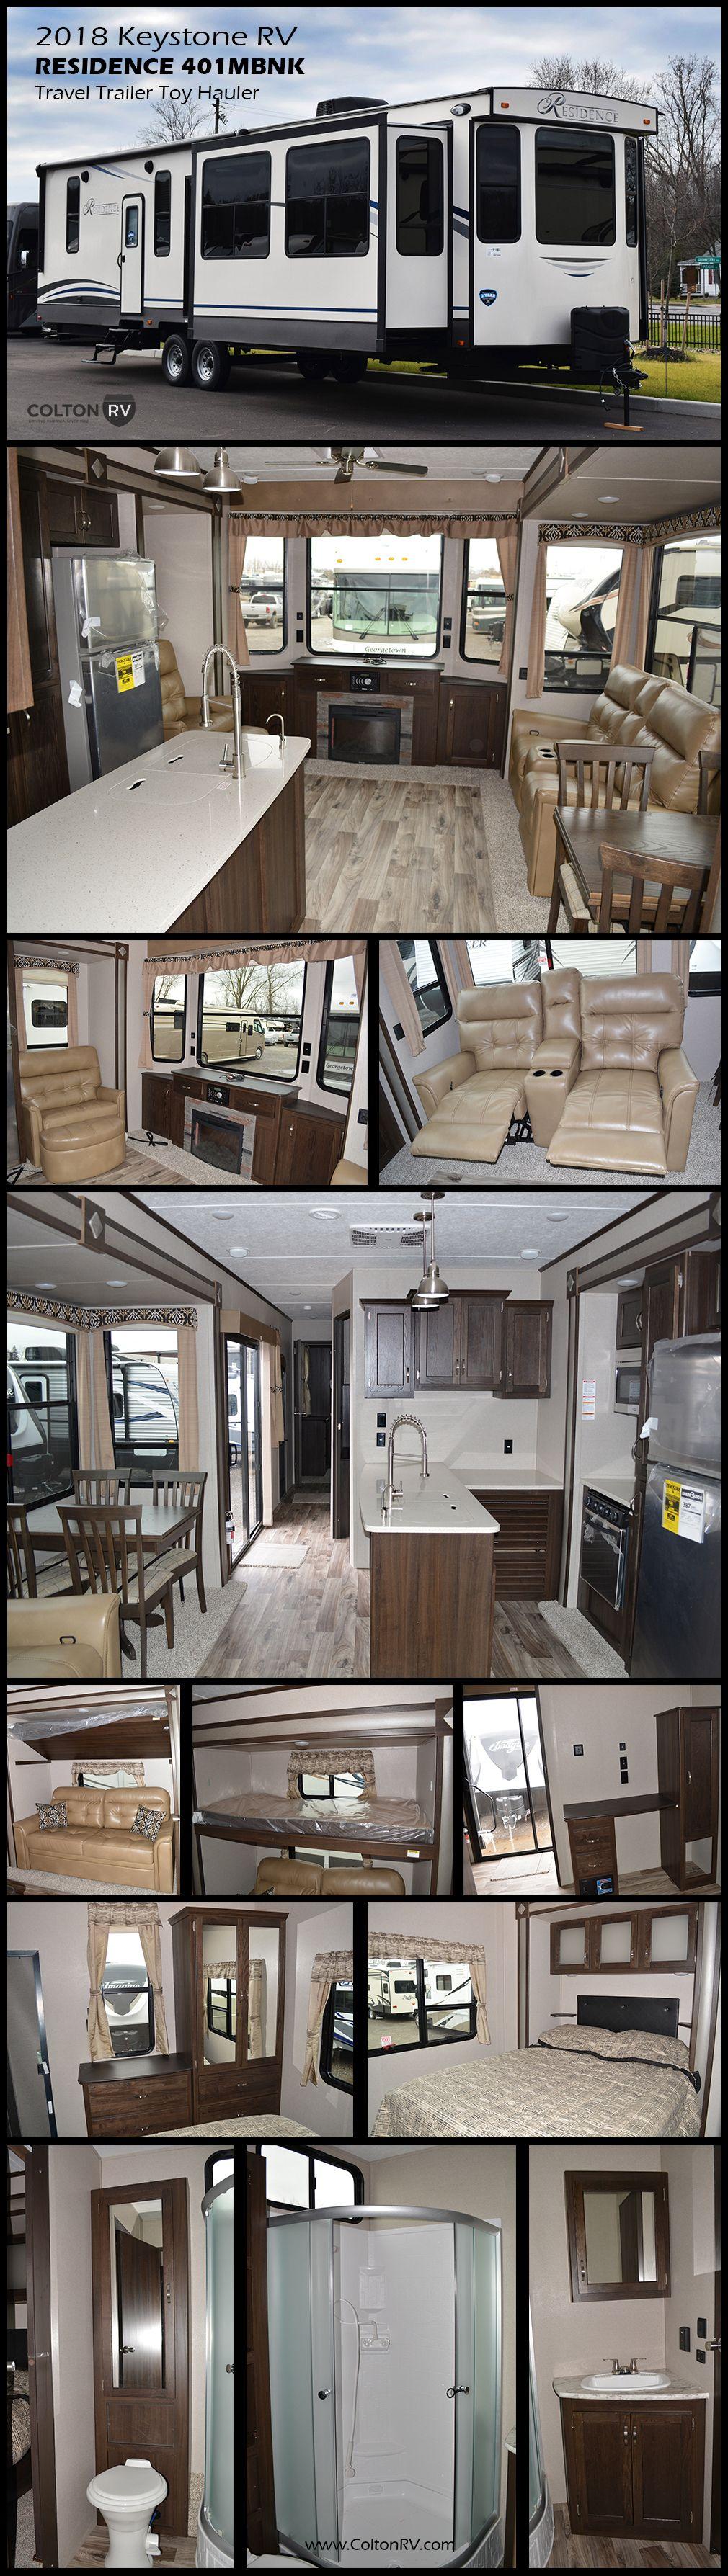 2018 Keystone Rv Residence 401mbnk Destination Travel Trailer Master King Suite Mulitpurpose Mid Den